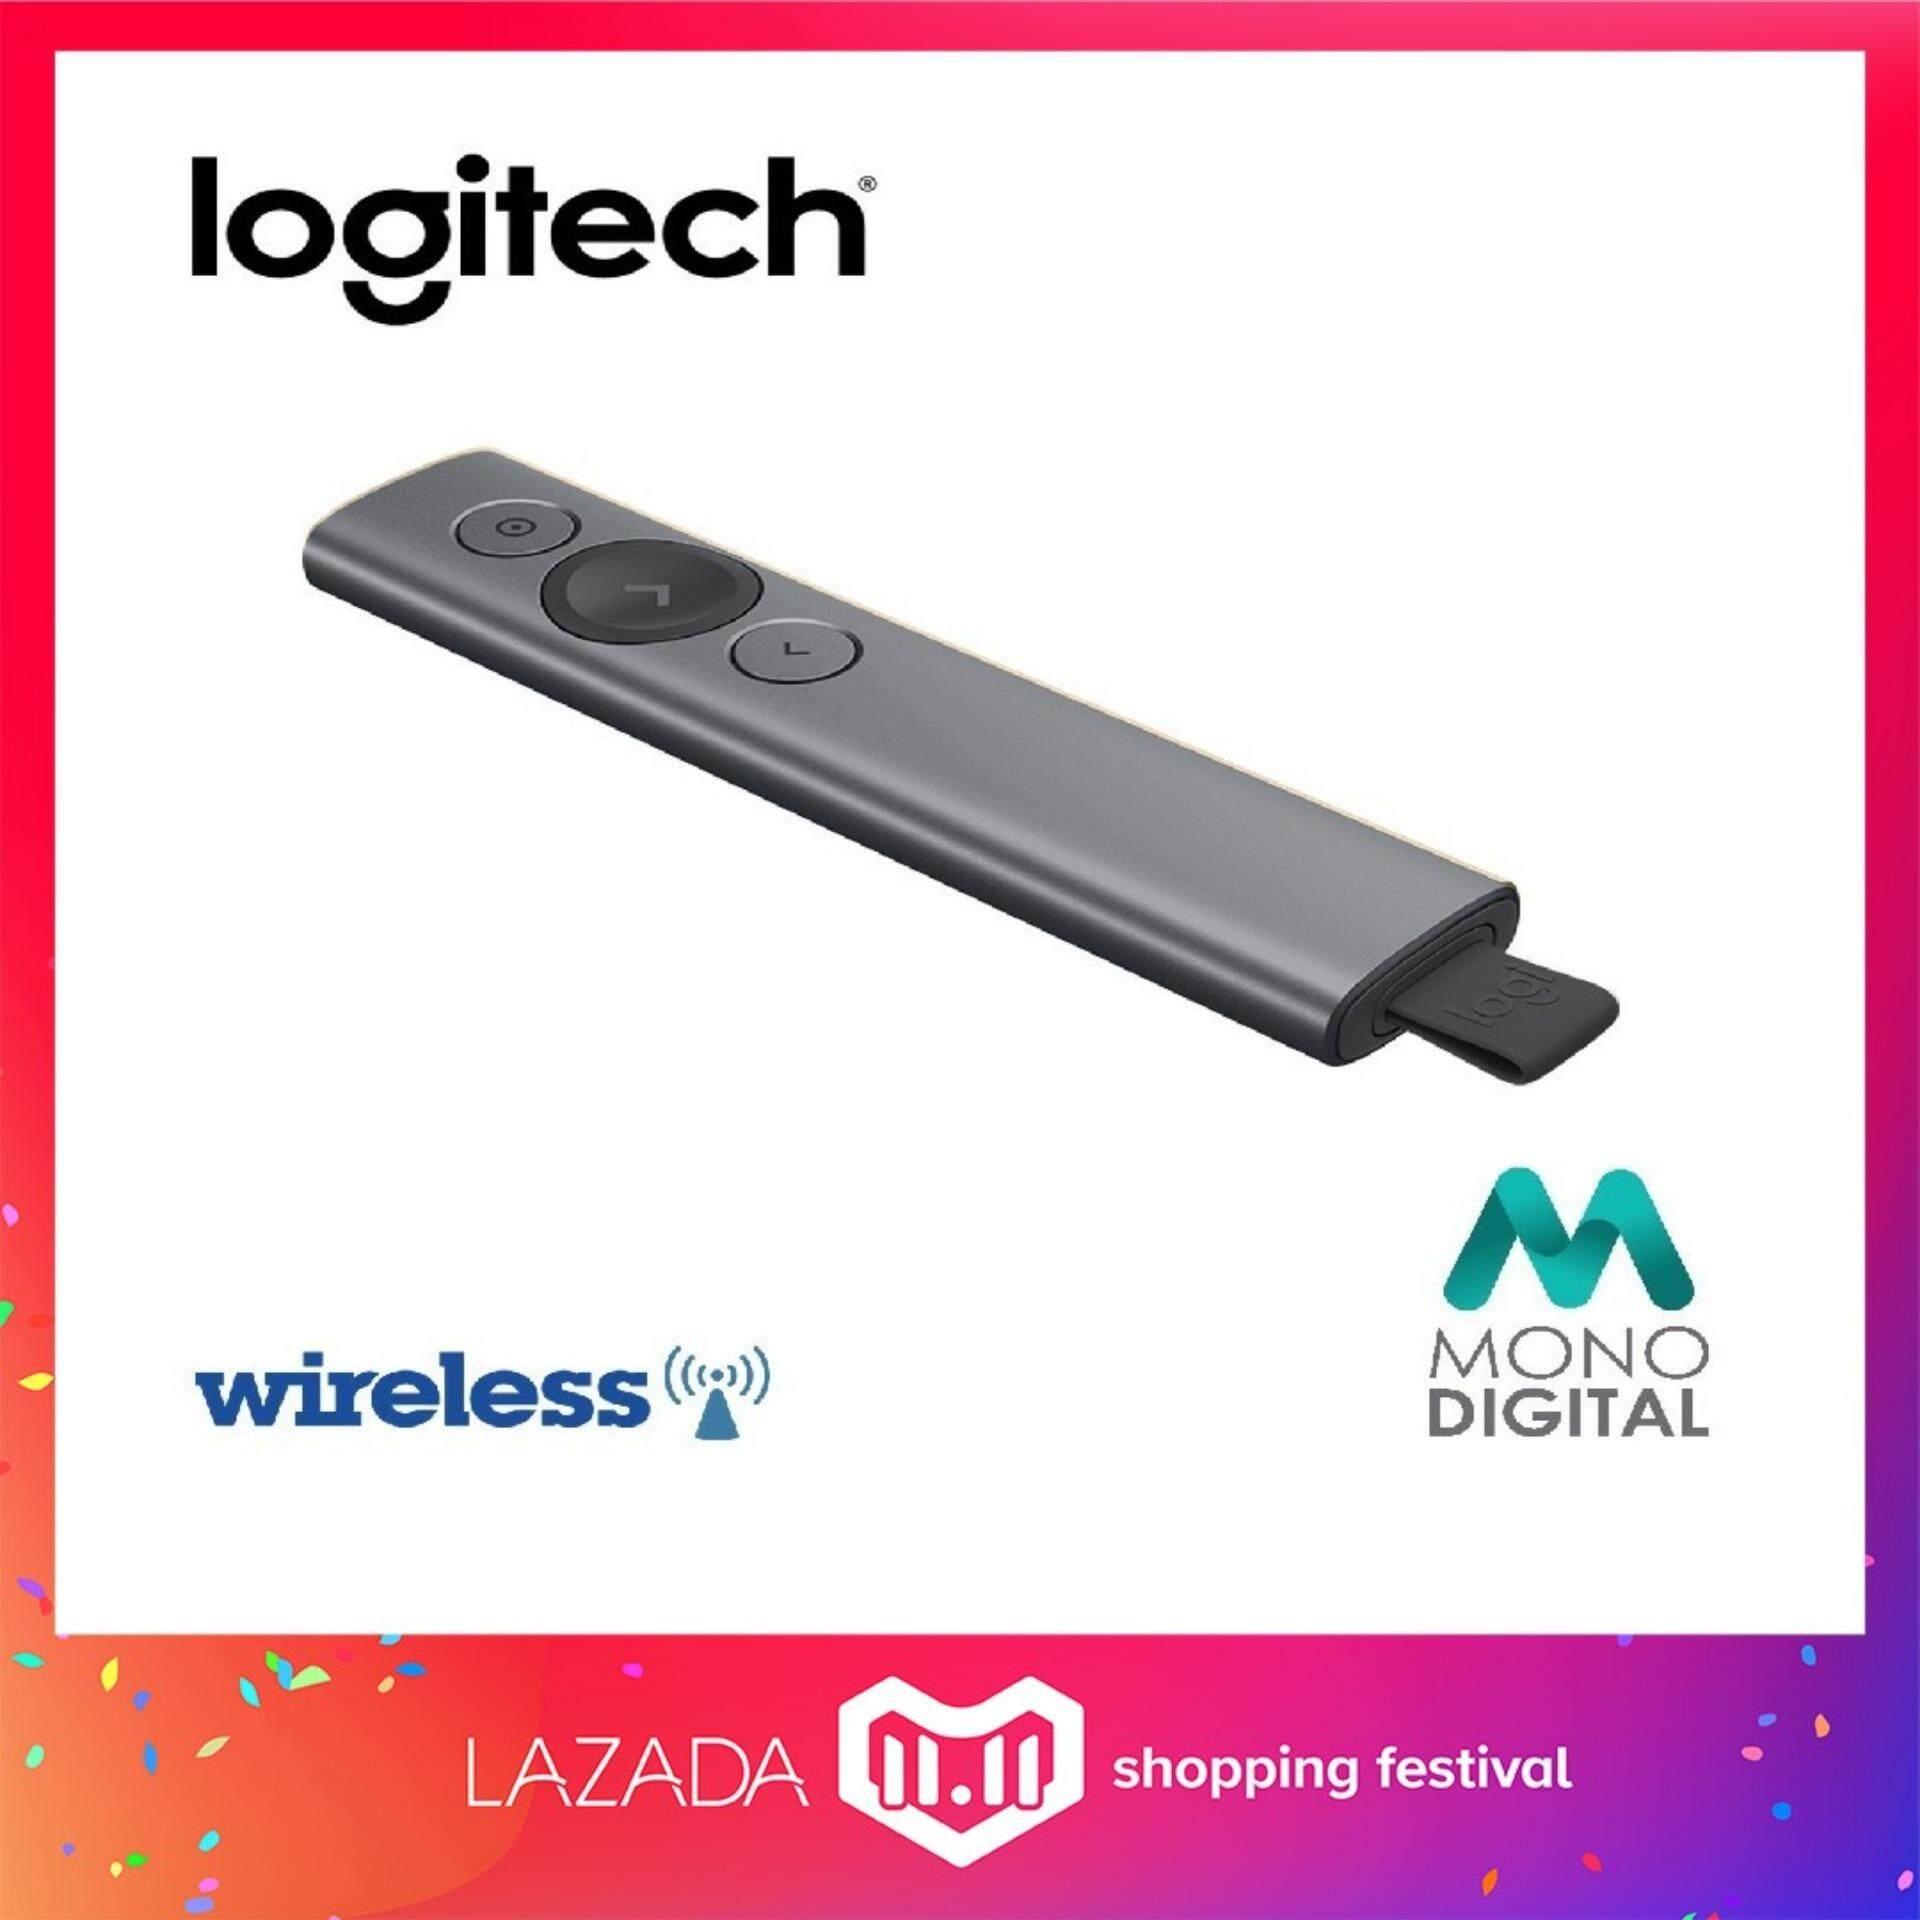 Logitech Spotlight Wireless Presentation Remote - Slate (910-004863) (Logitech Malaysia) Malaysia